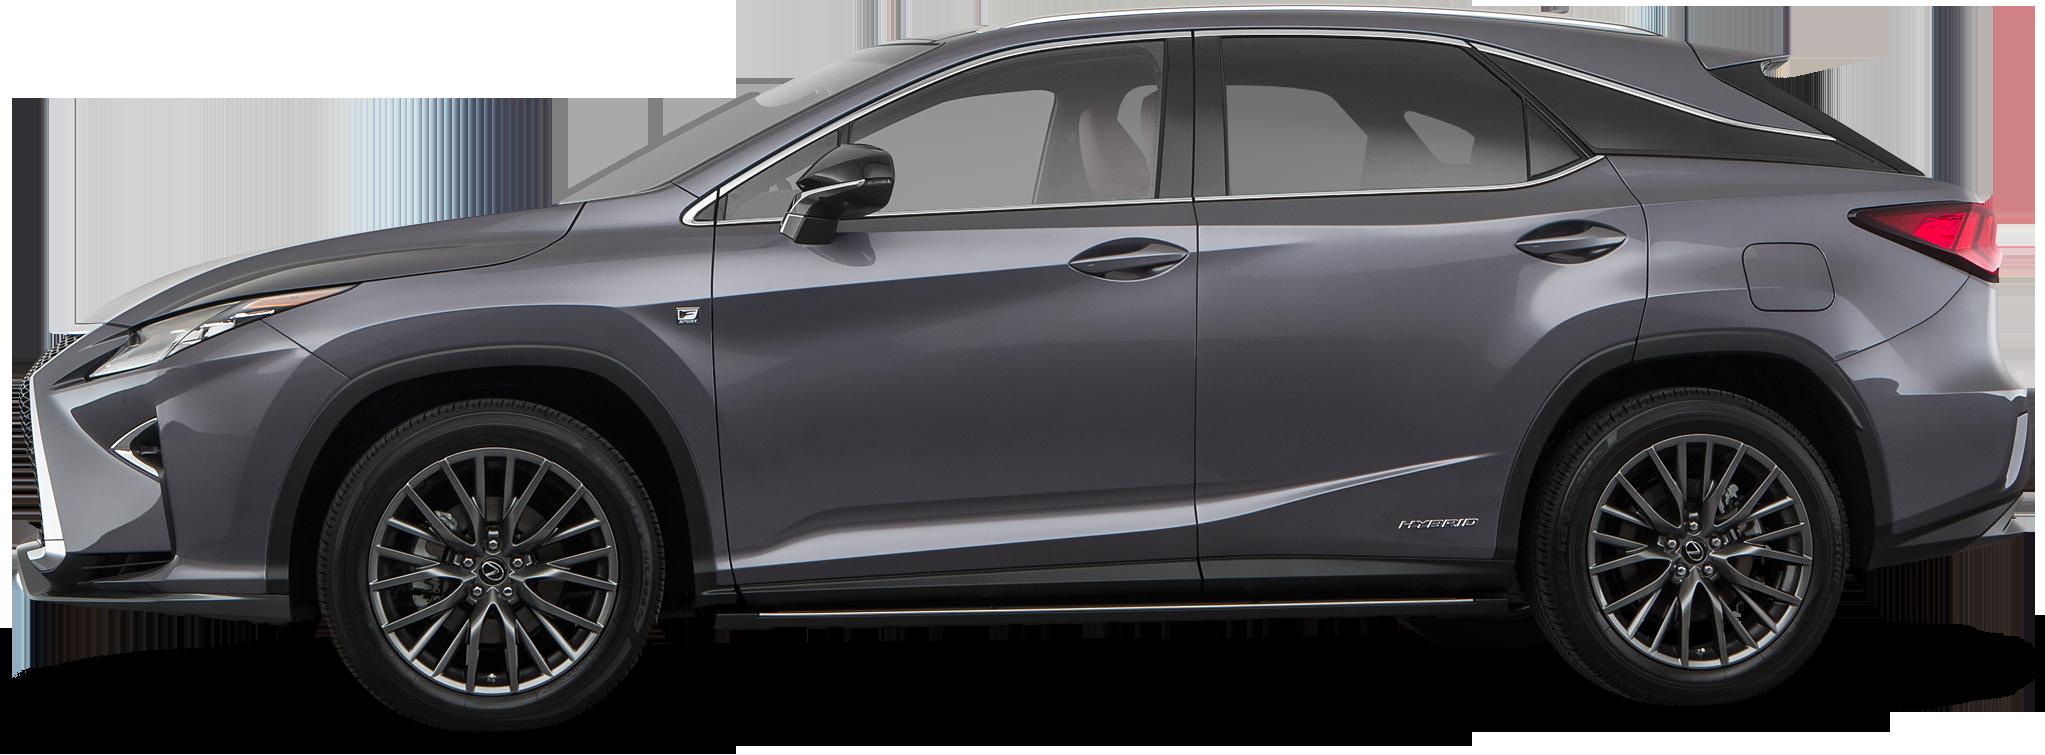 2019 Lexus RX 450h SUV F Sport